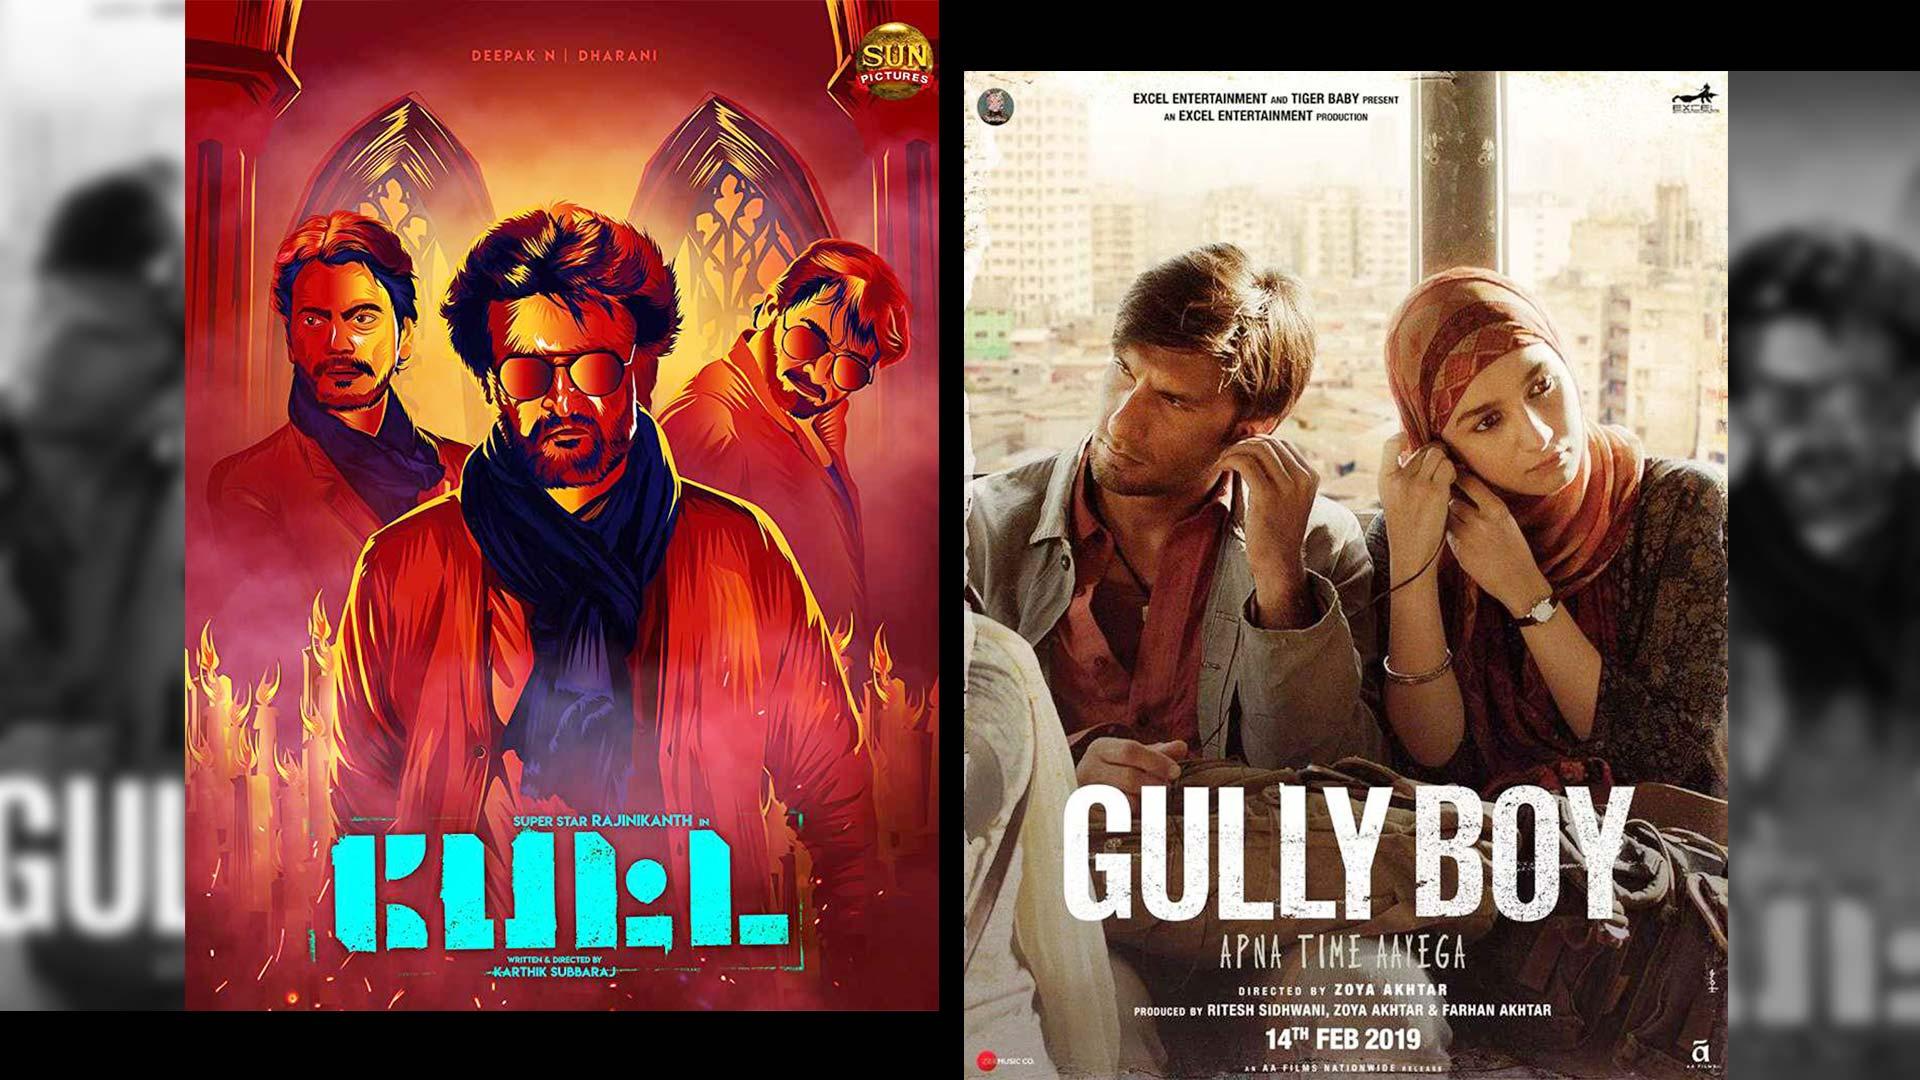 MyCoolmoviez website 2021 - Best latest Movies Download Portal